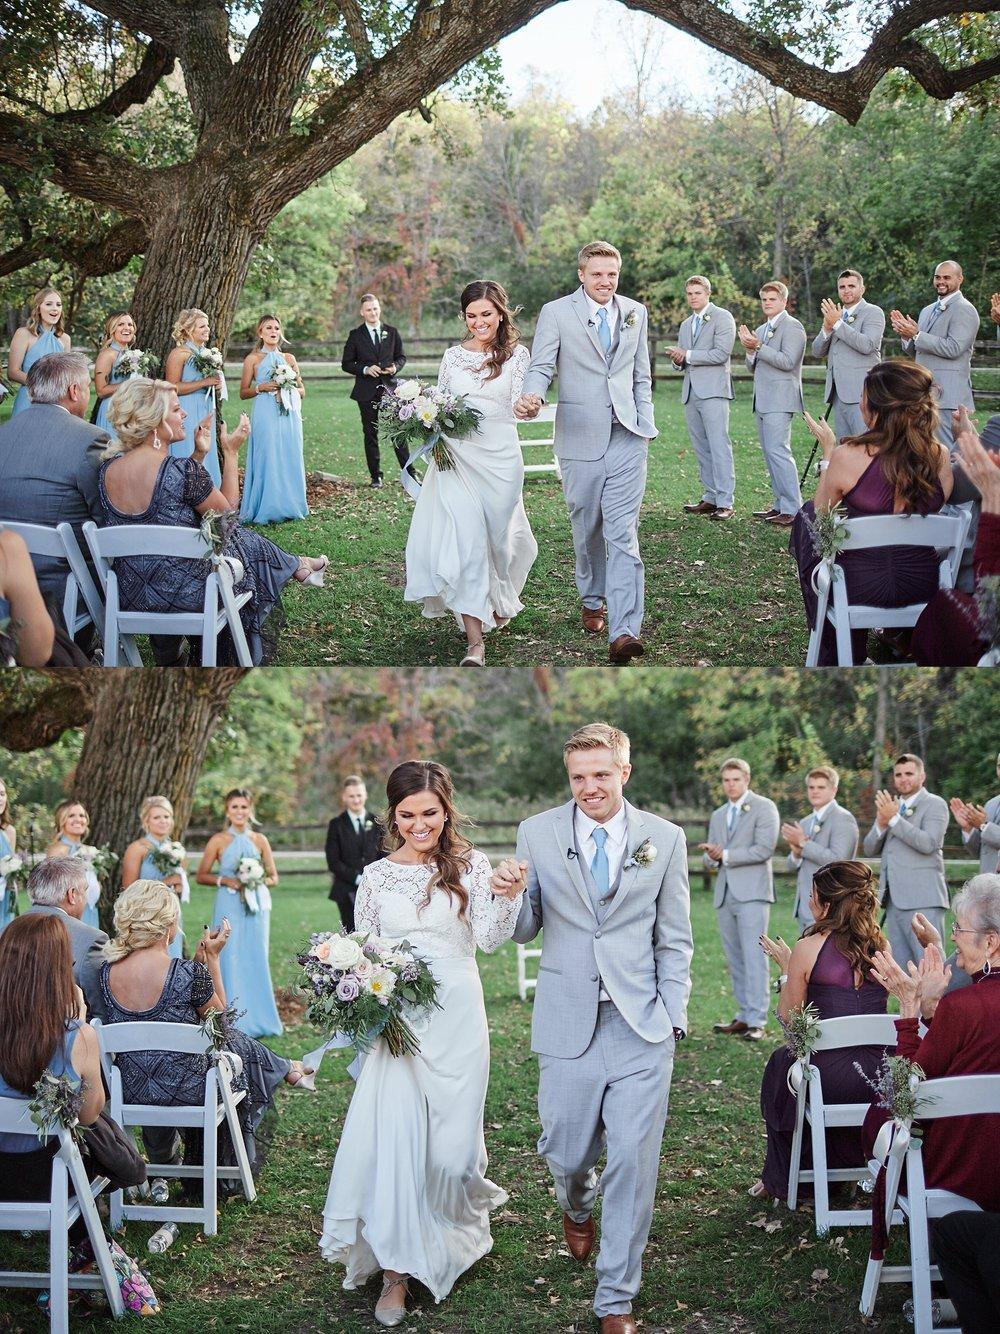 Maywood-Stone-Barn-Wedding-Rochester-Minnesota-Perry-James-Photo_0655.jpg